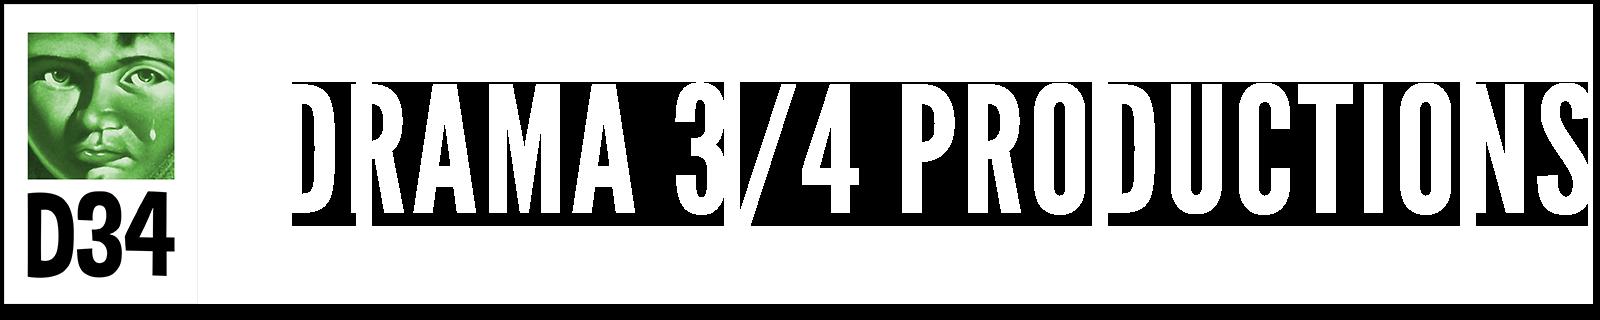 drama34